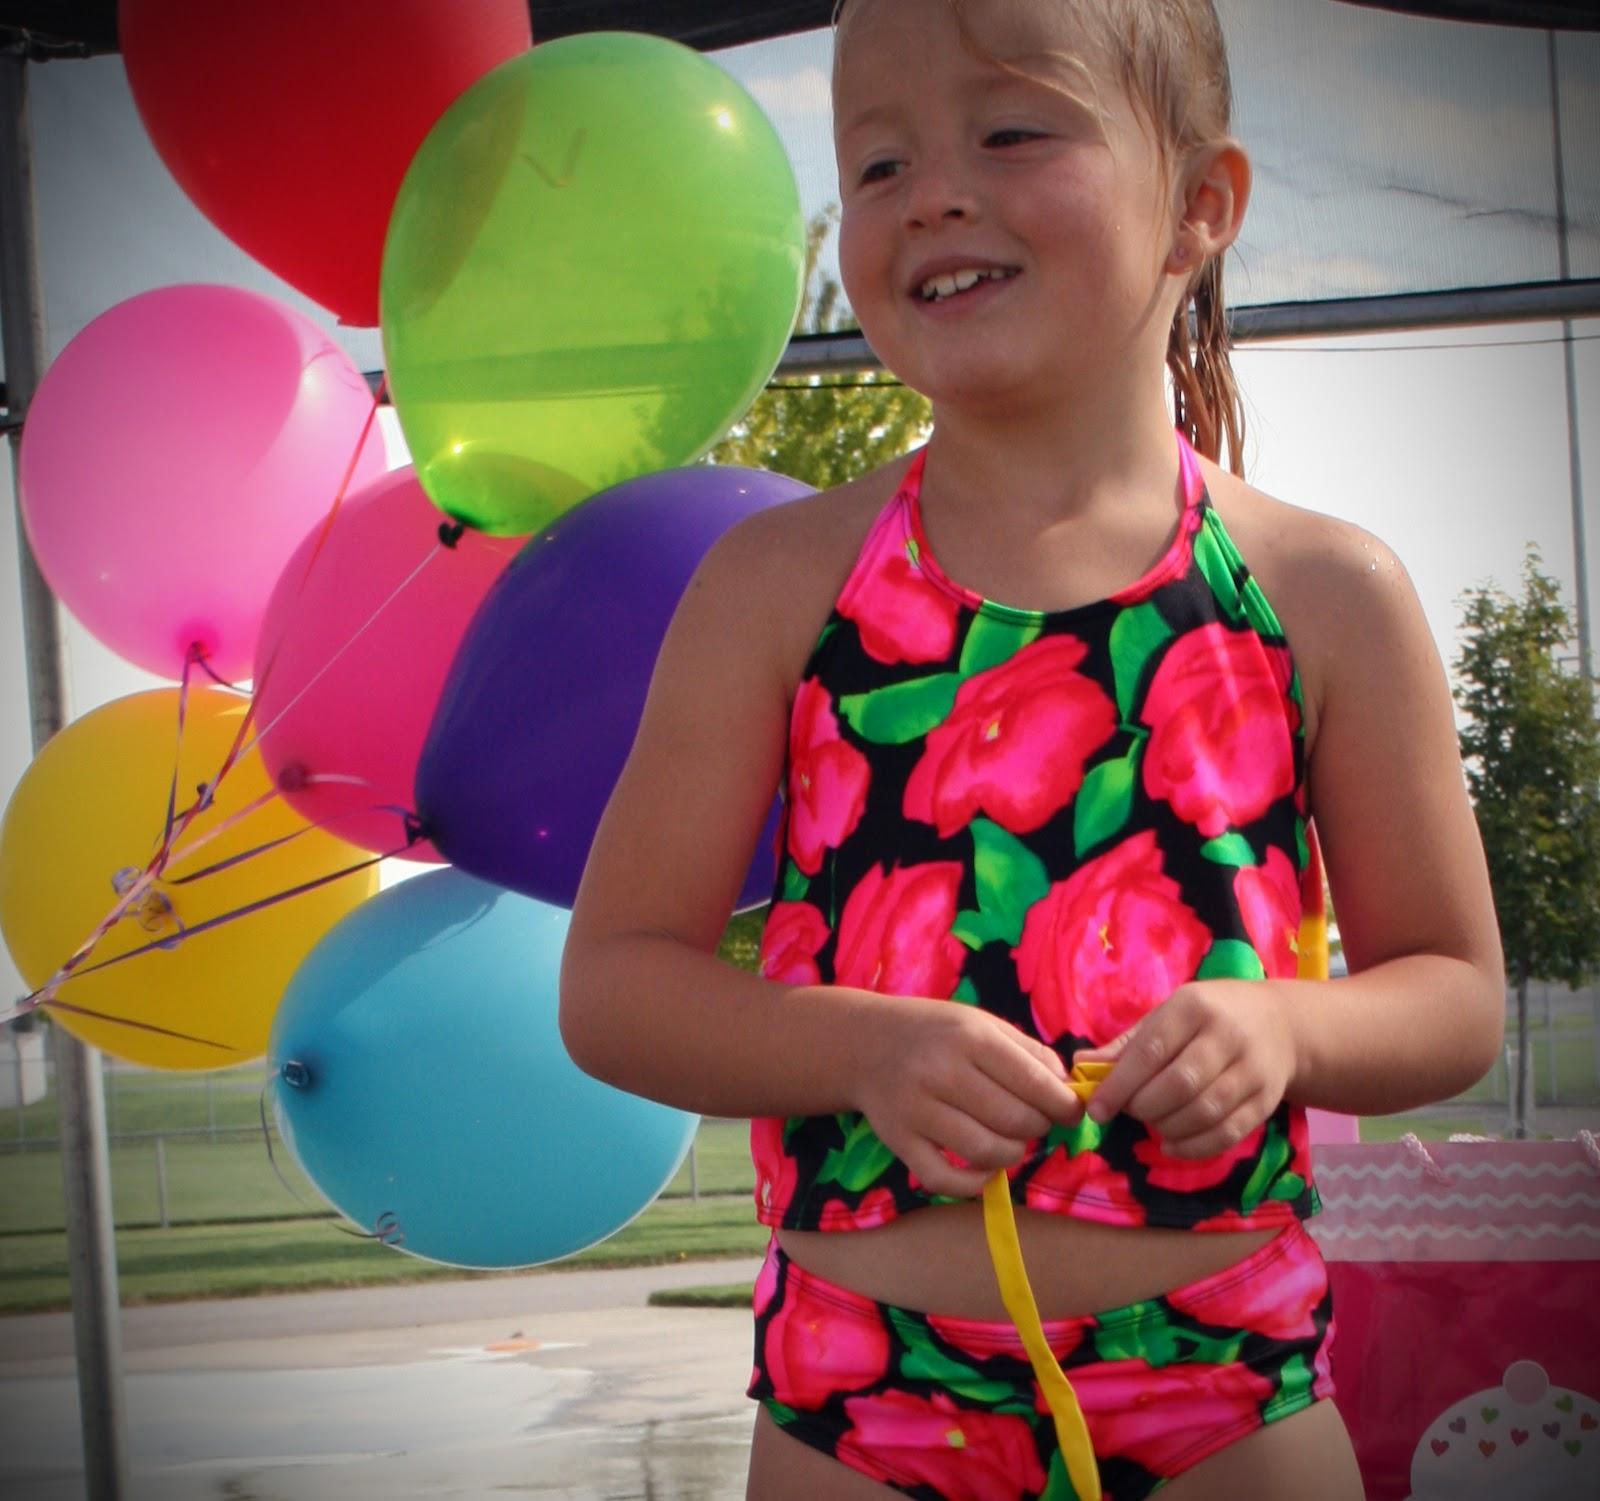 Little Girls In Their Birthday Suit Her birthday suit